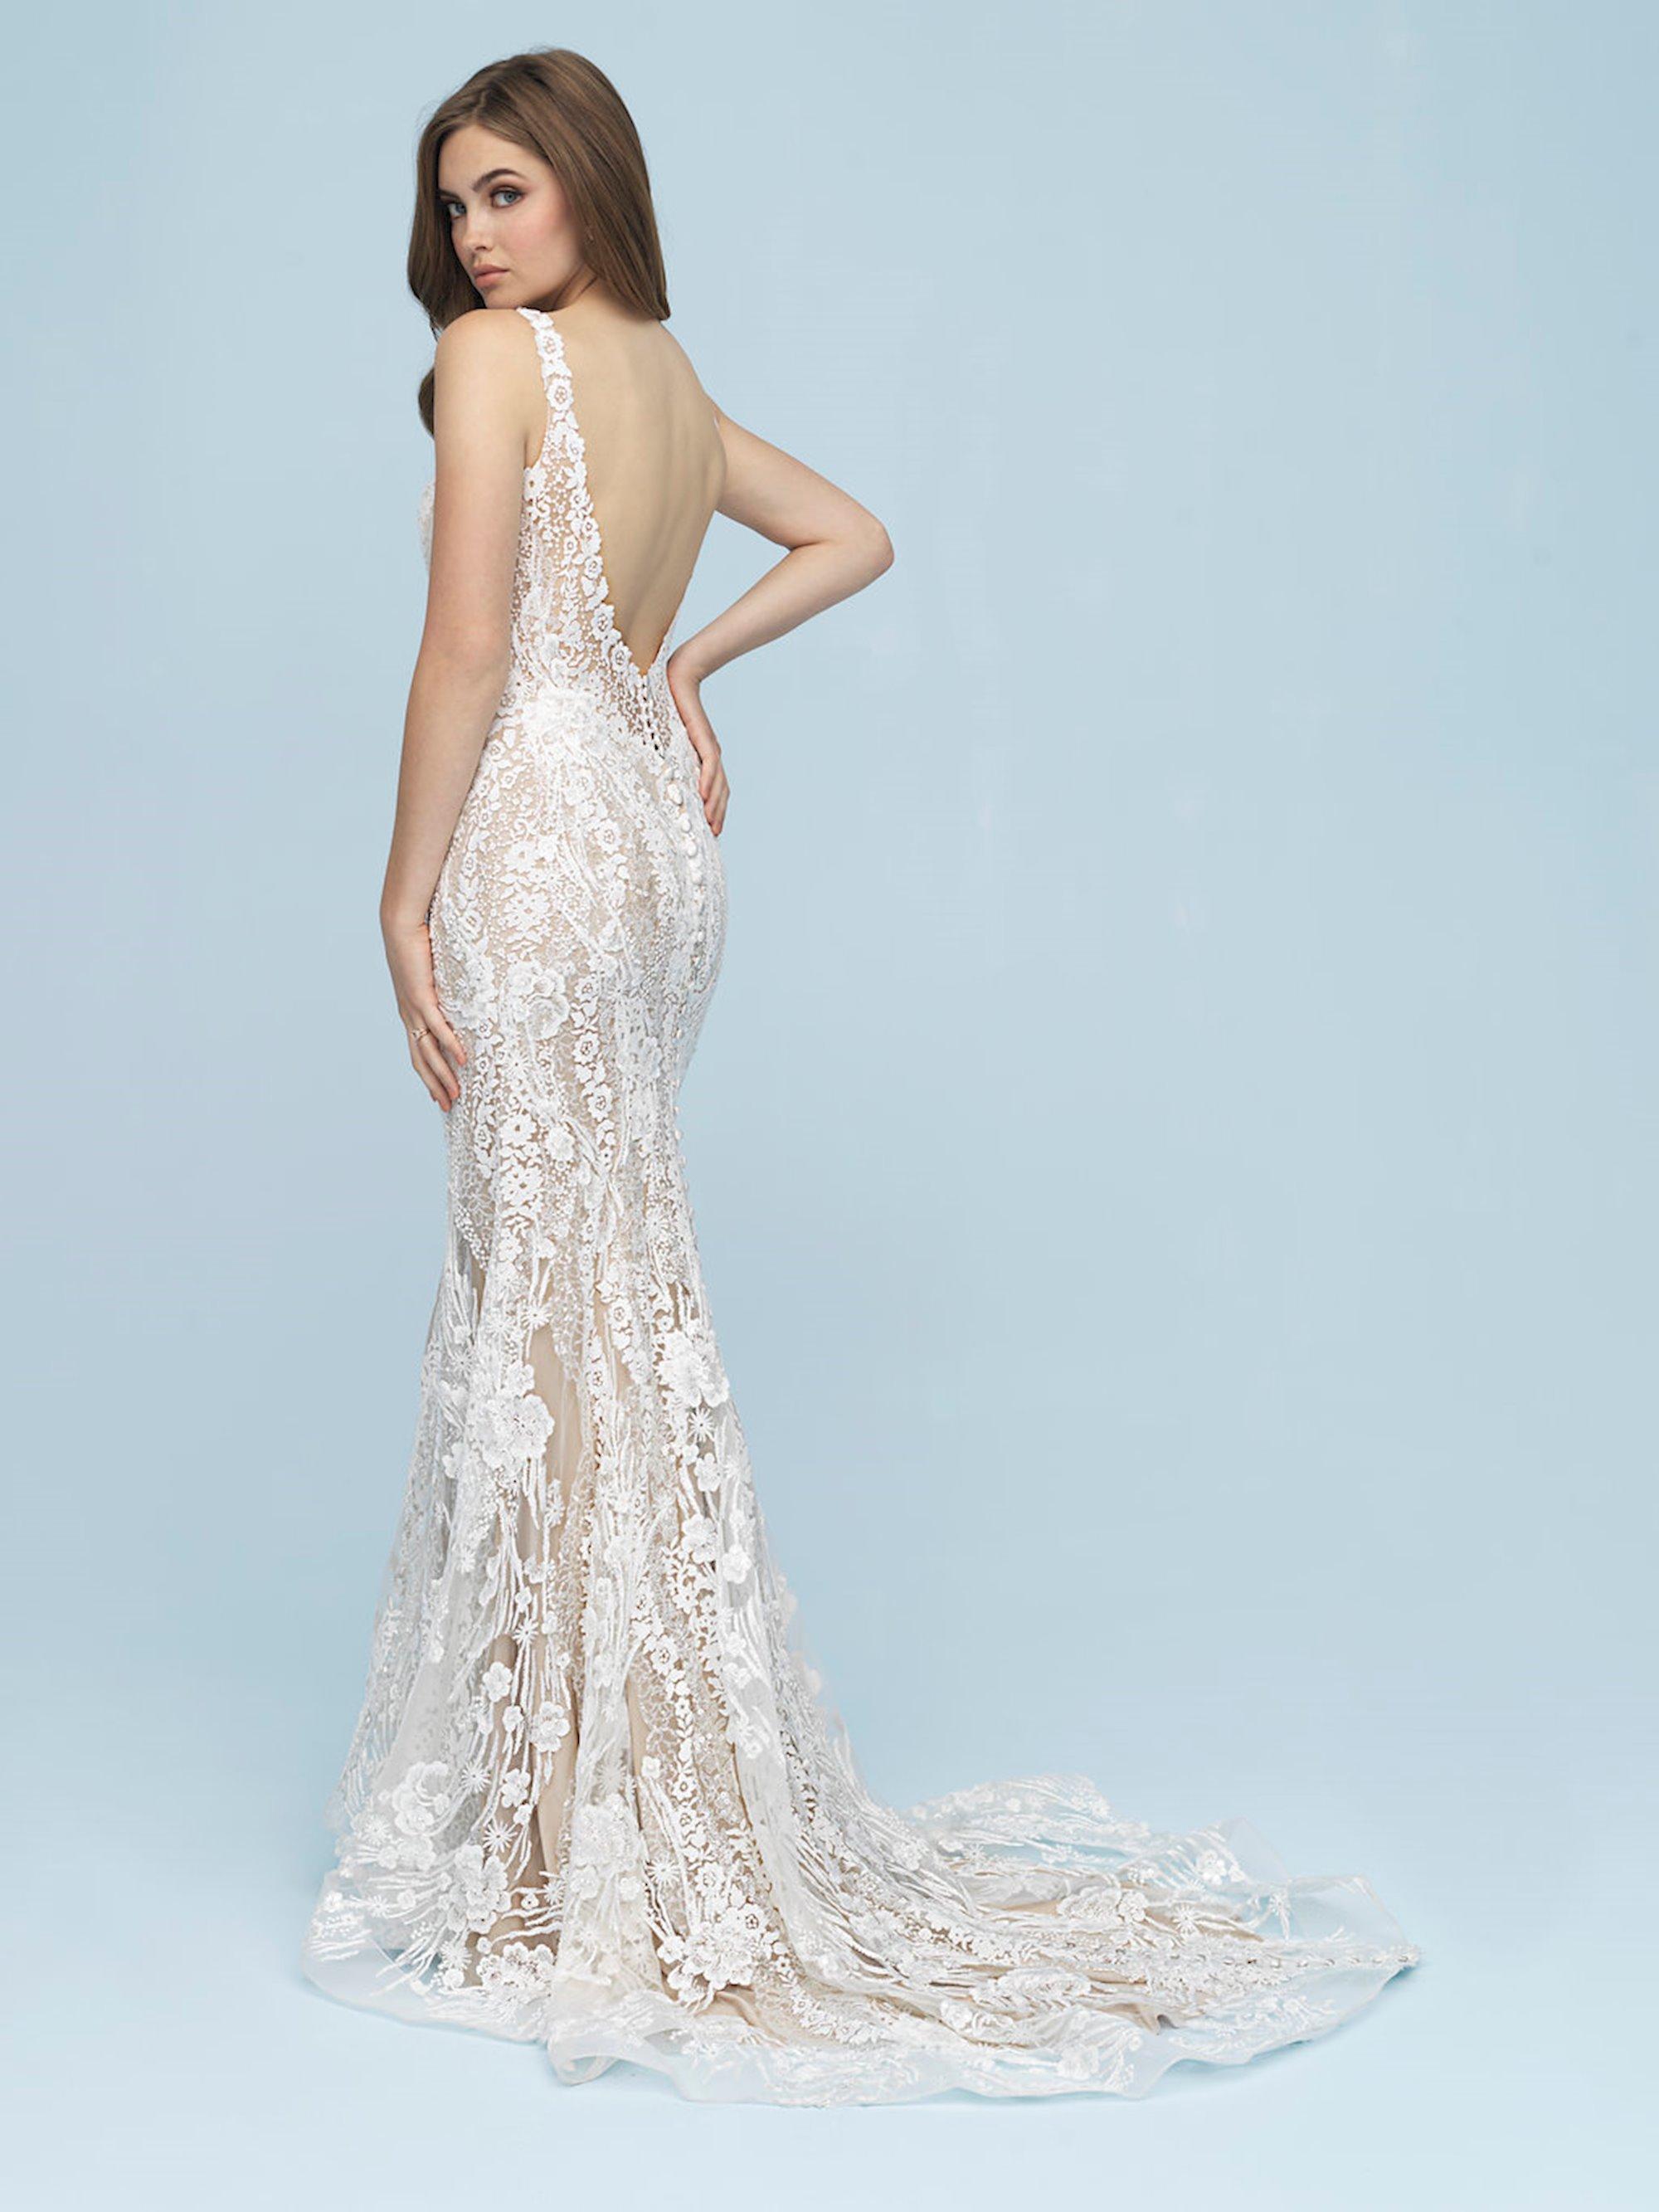 666824aec652e Allure Bridals - 9618 | Amanda's Touch Bridal and Formal